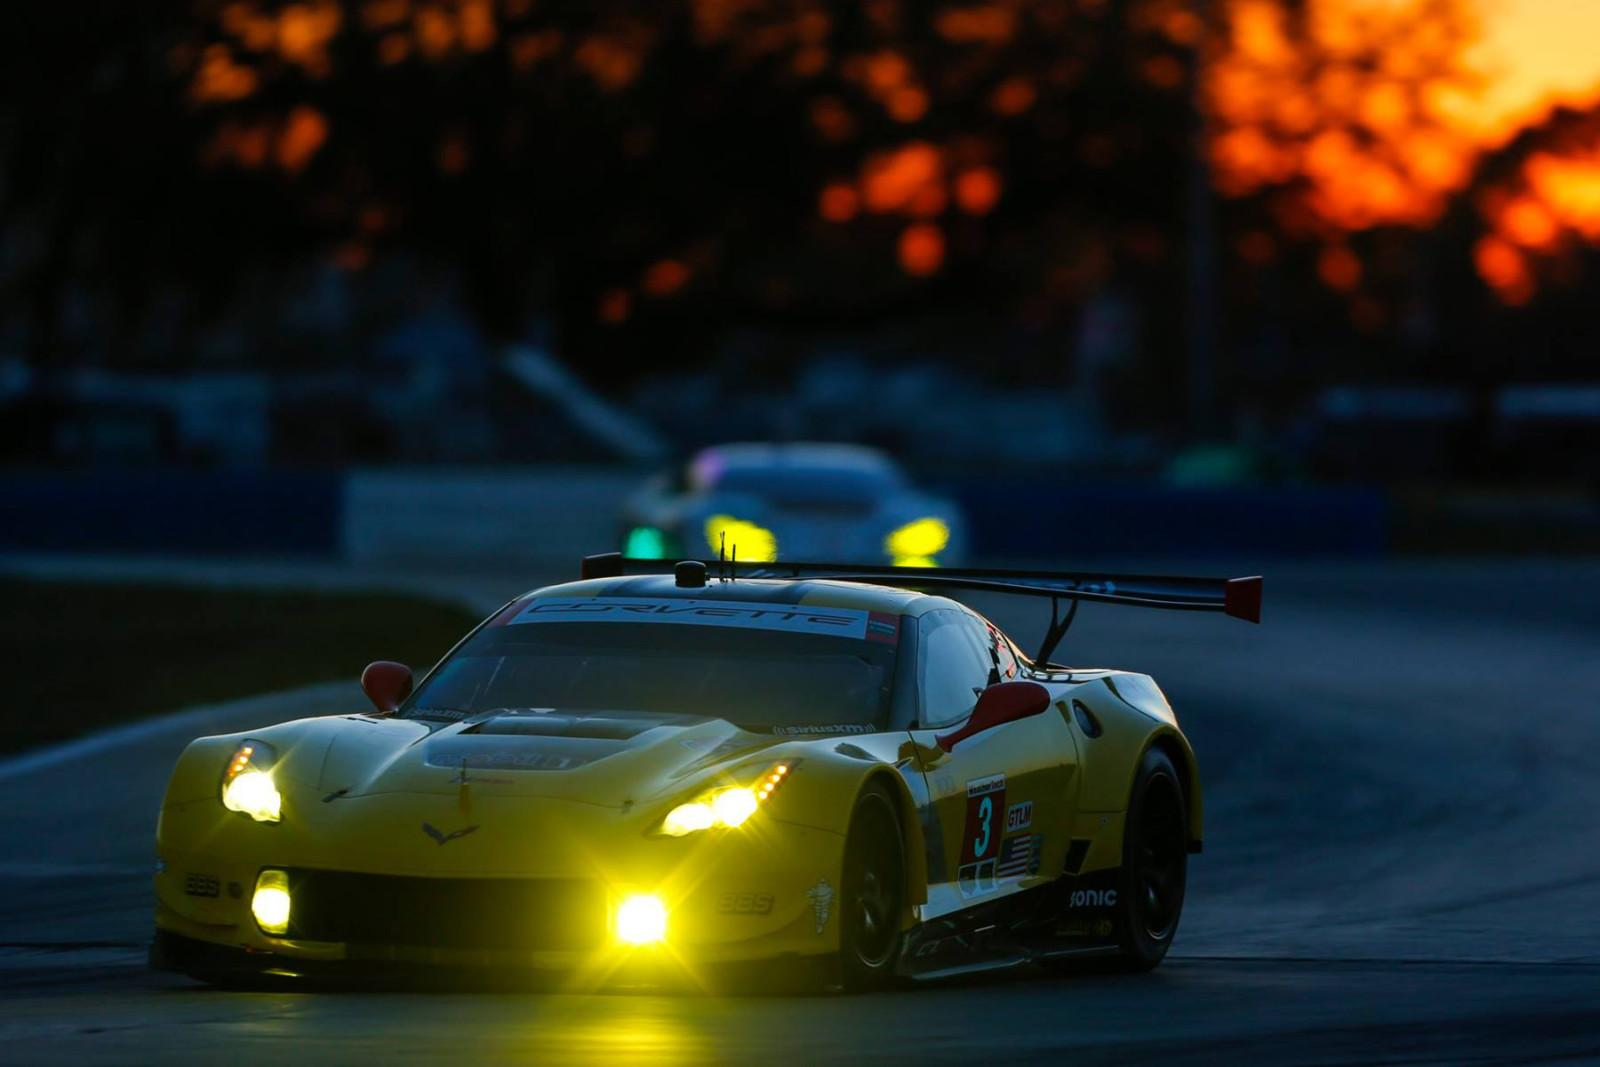 Corvette win Sebring - Wayne Taylor Racing offre Sebring à Cadillac, Corvette et Riley Motorsports victorieux en GT